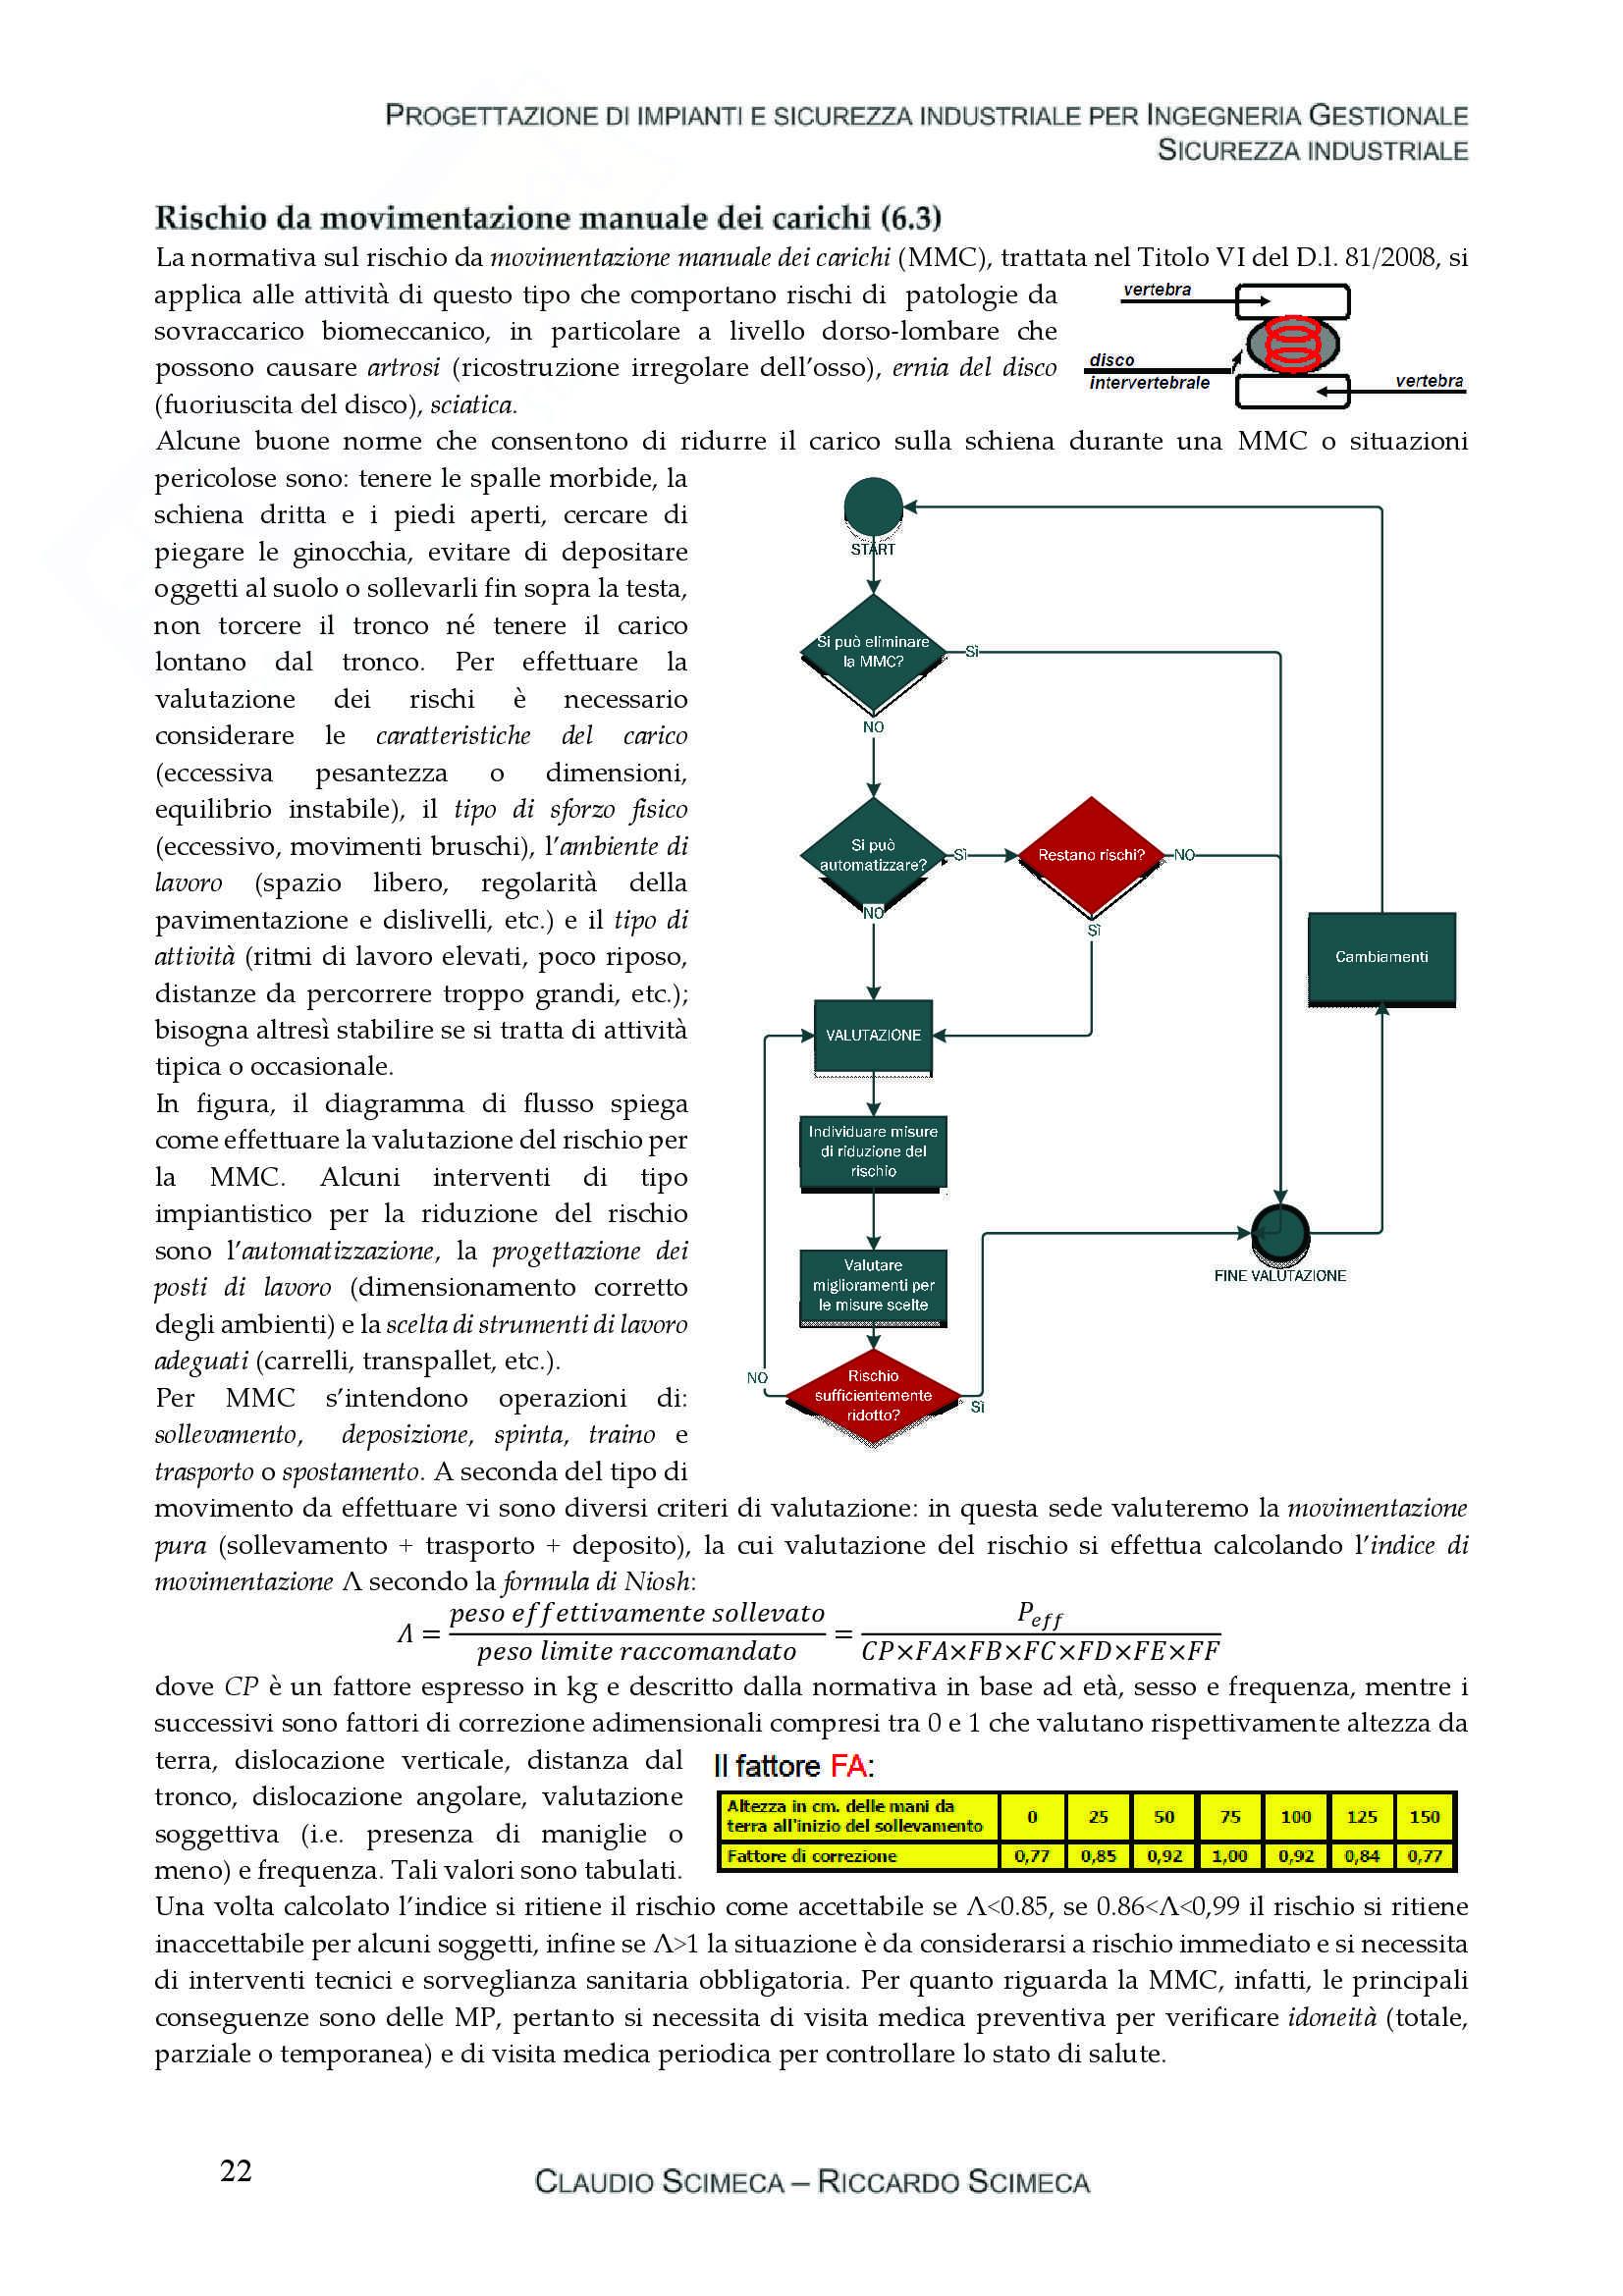 Sicurezza Industriale Pag. 26